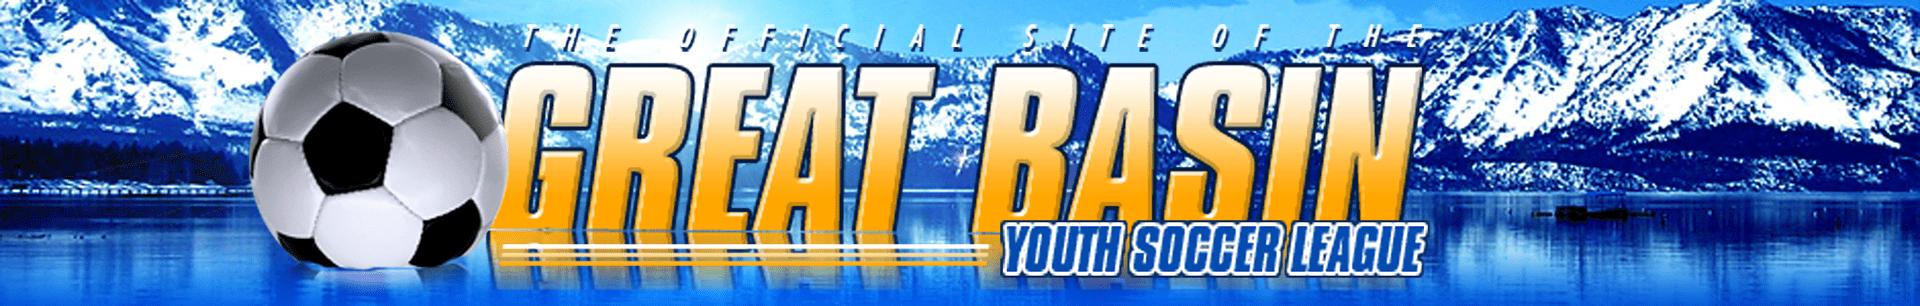 Great Basin Youth Soccer LEague